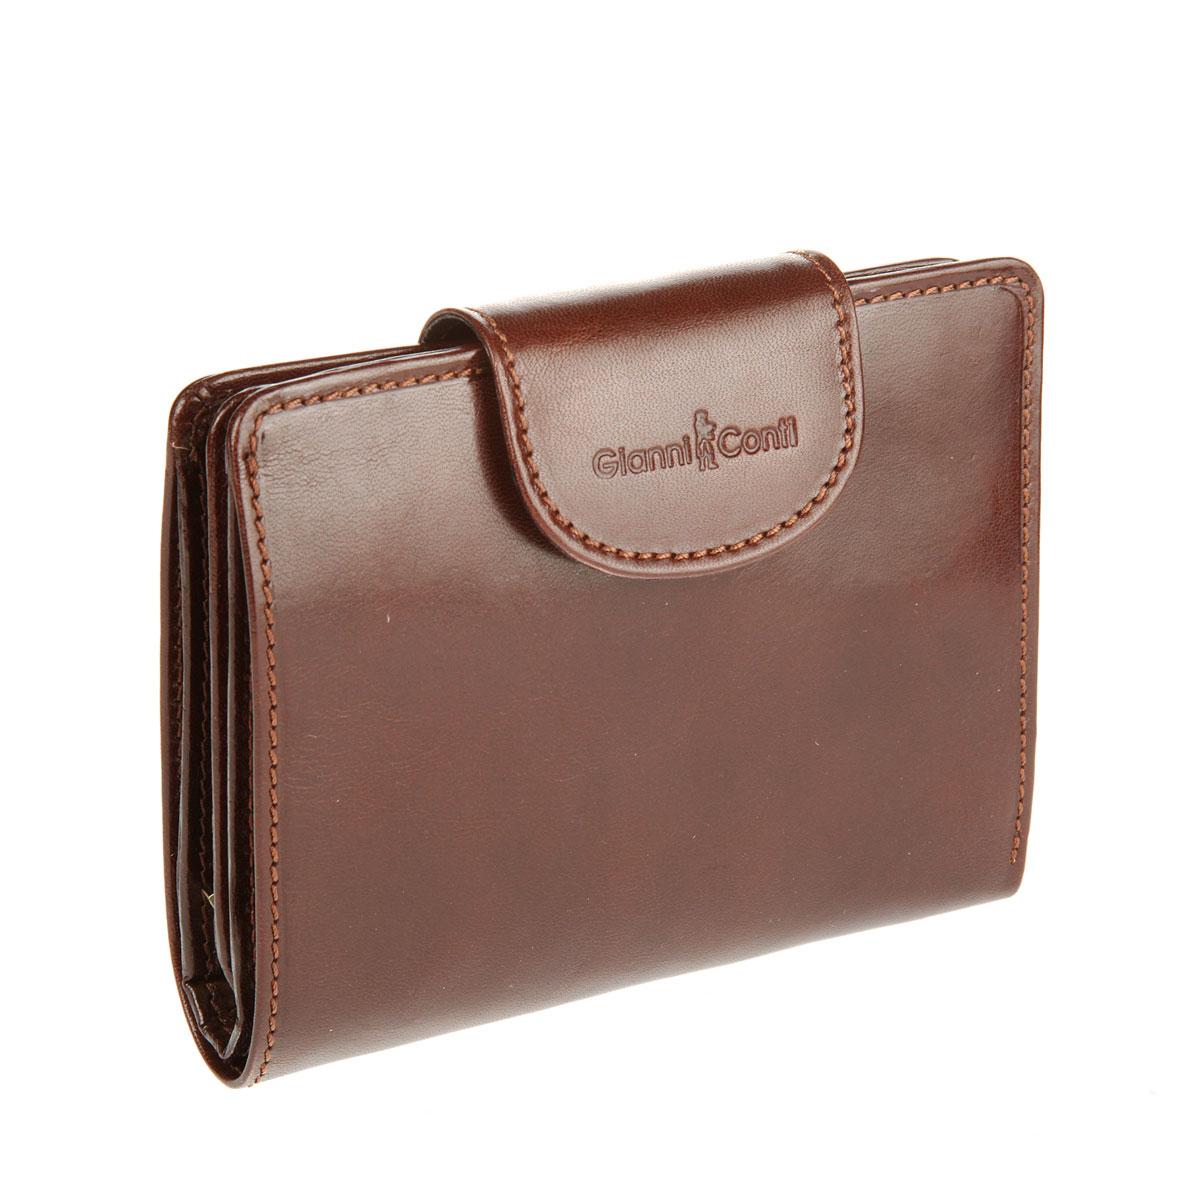 Портмоне мужское Gianni Conti, цвет: коричневый. 908029 908029 brown